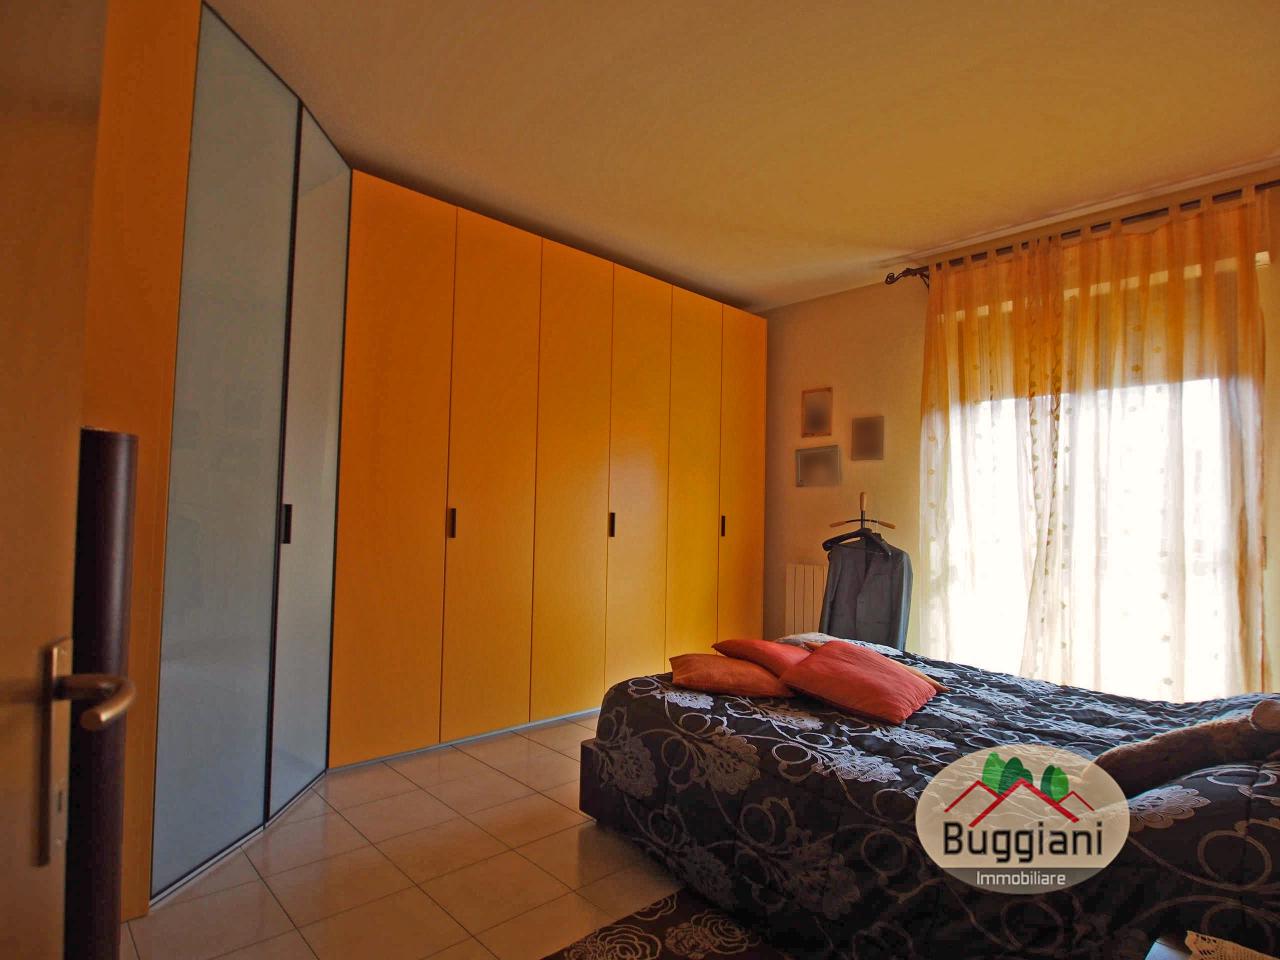 Appartamento in vendita RIF. 1929, Montopoli in Val d'Arno (PI)